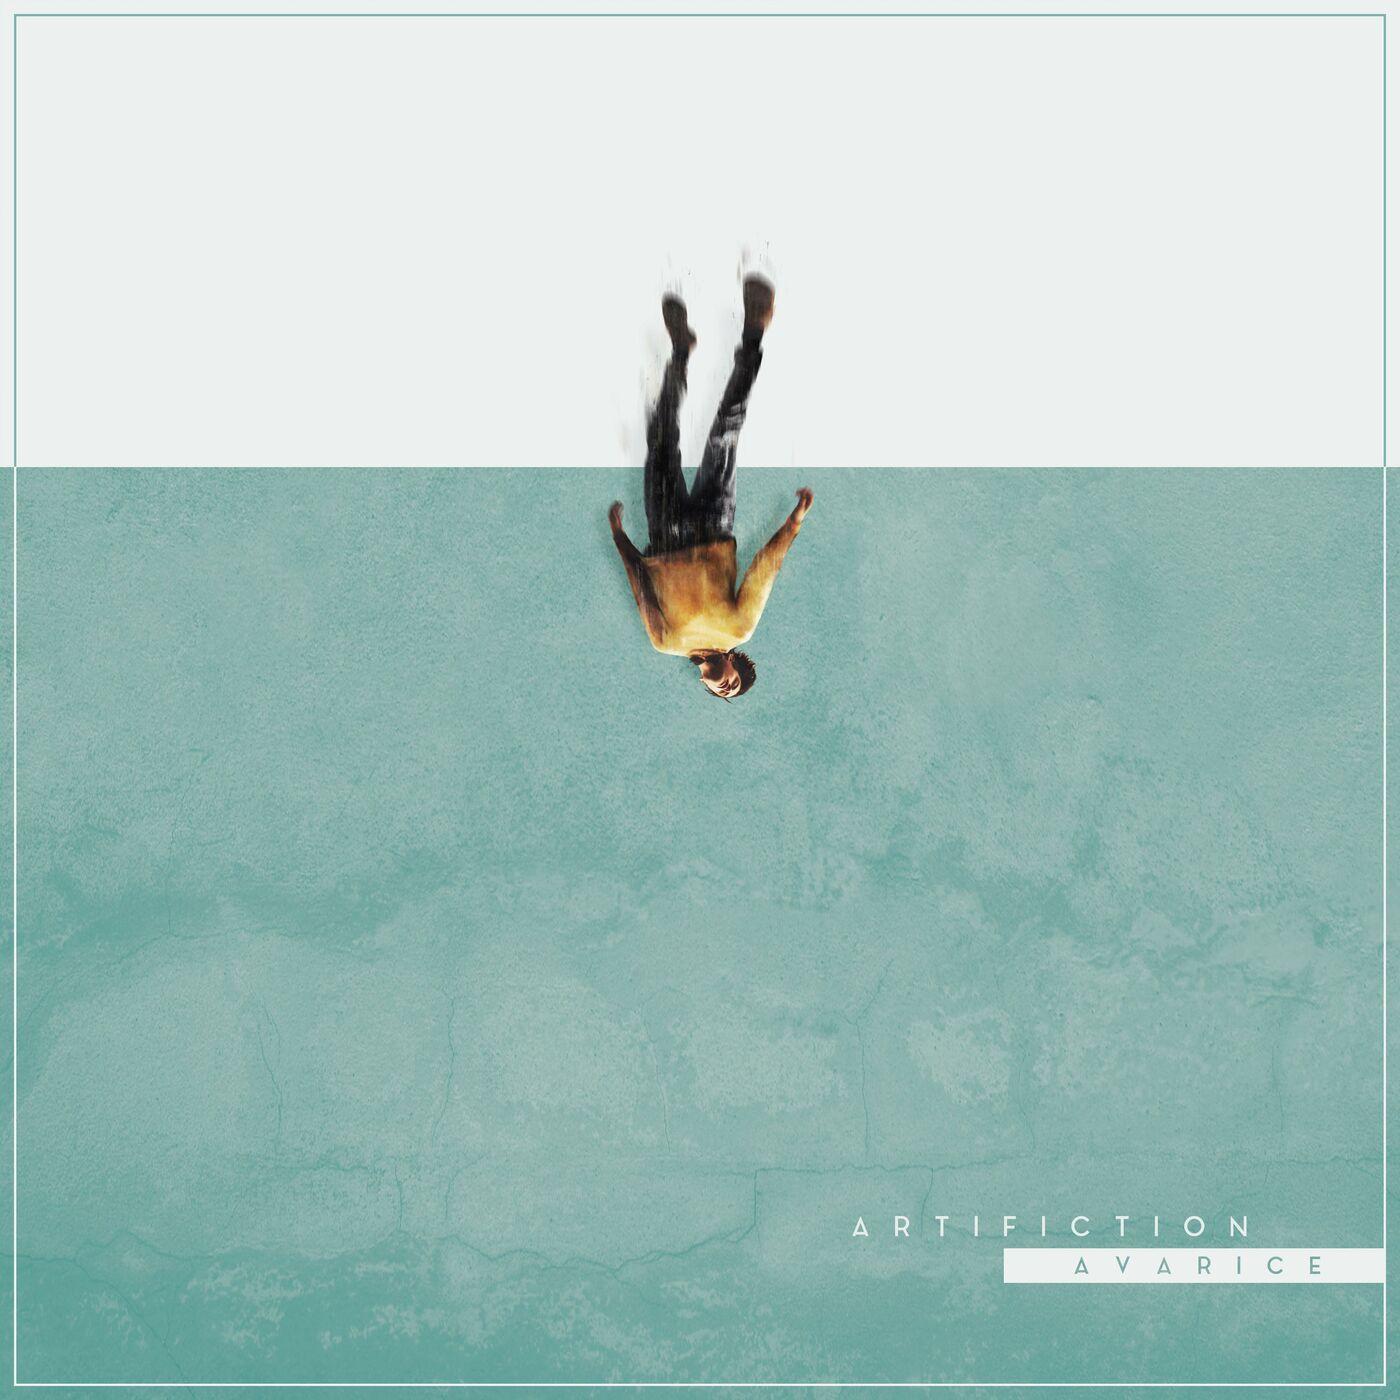 Artifiction - Avarice [single] (2019)